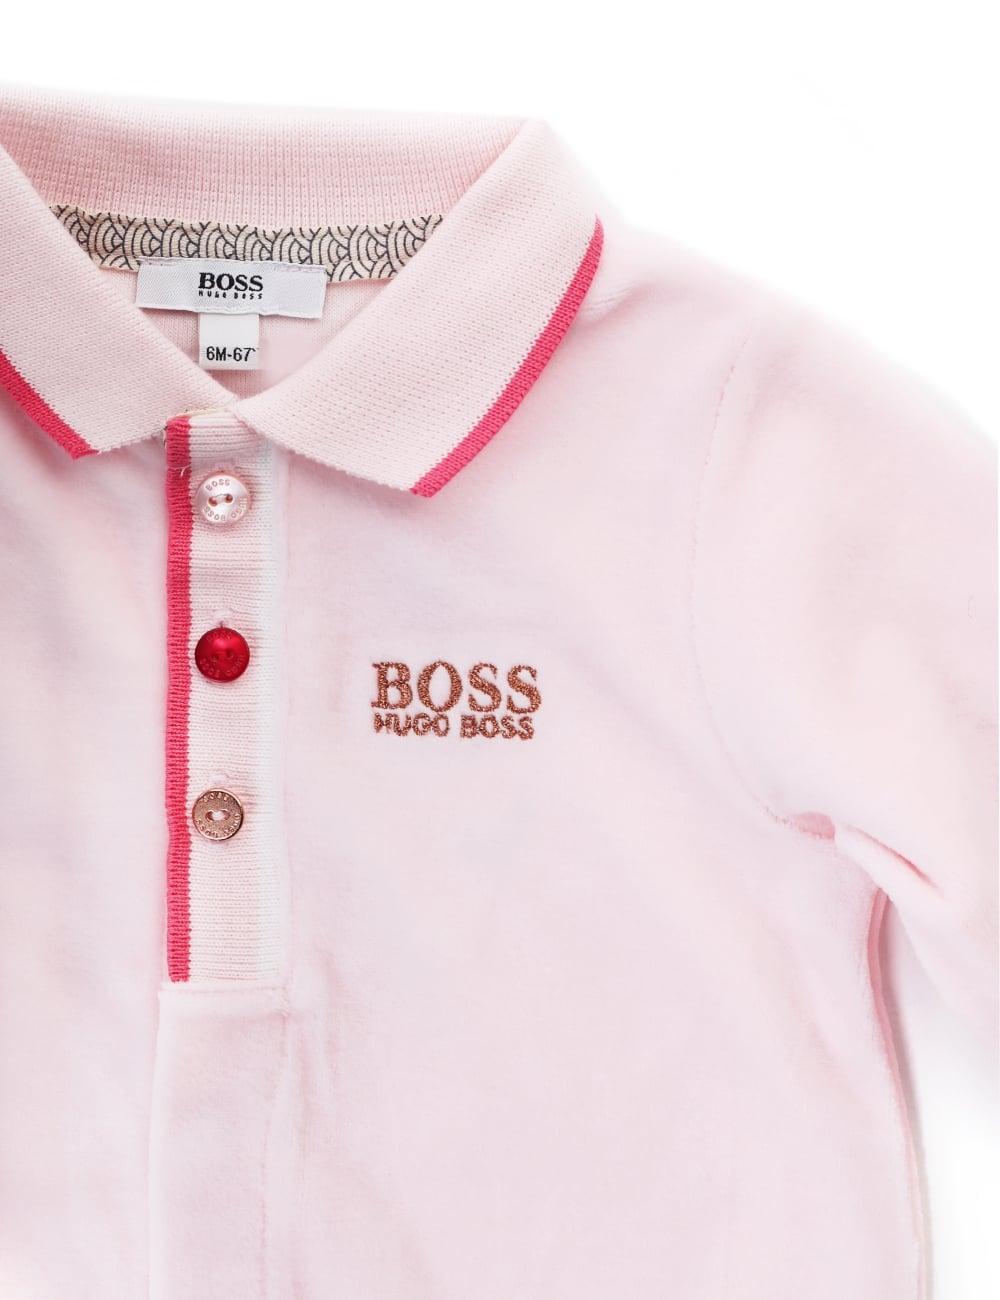 9bc84e8654a74 Hugo Boss Baby Girls One Piece Pyjamas